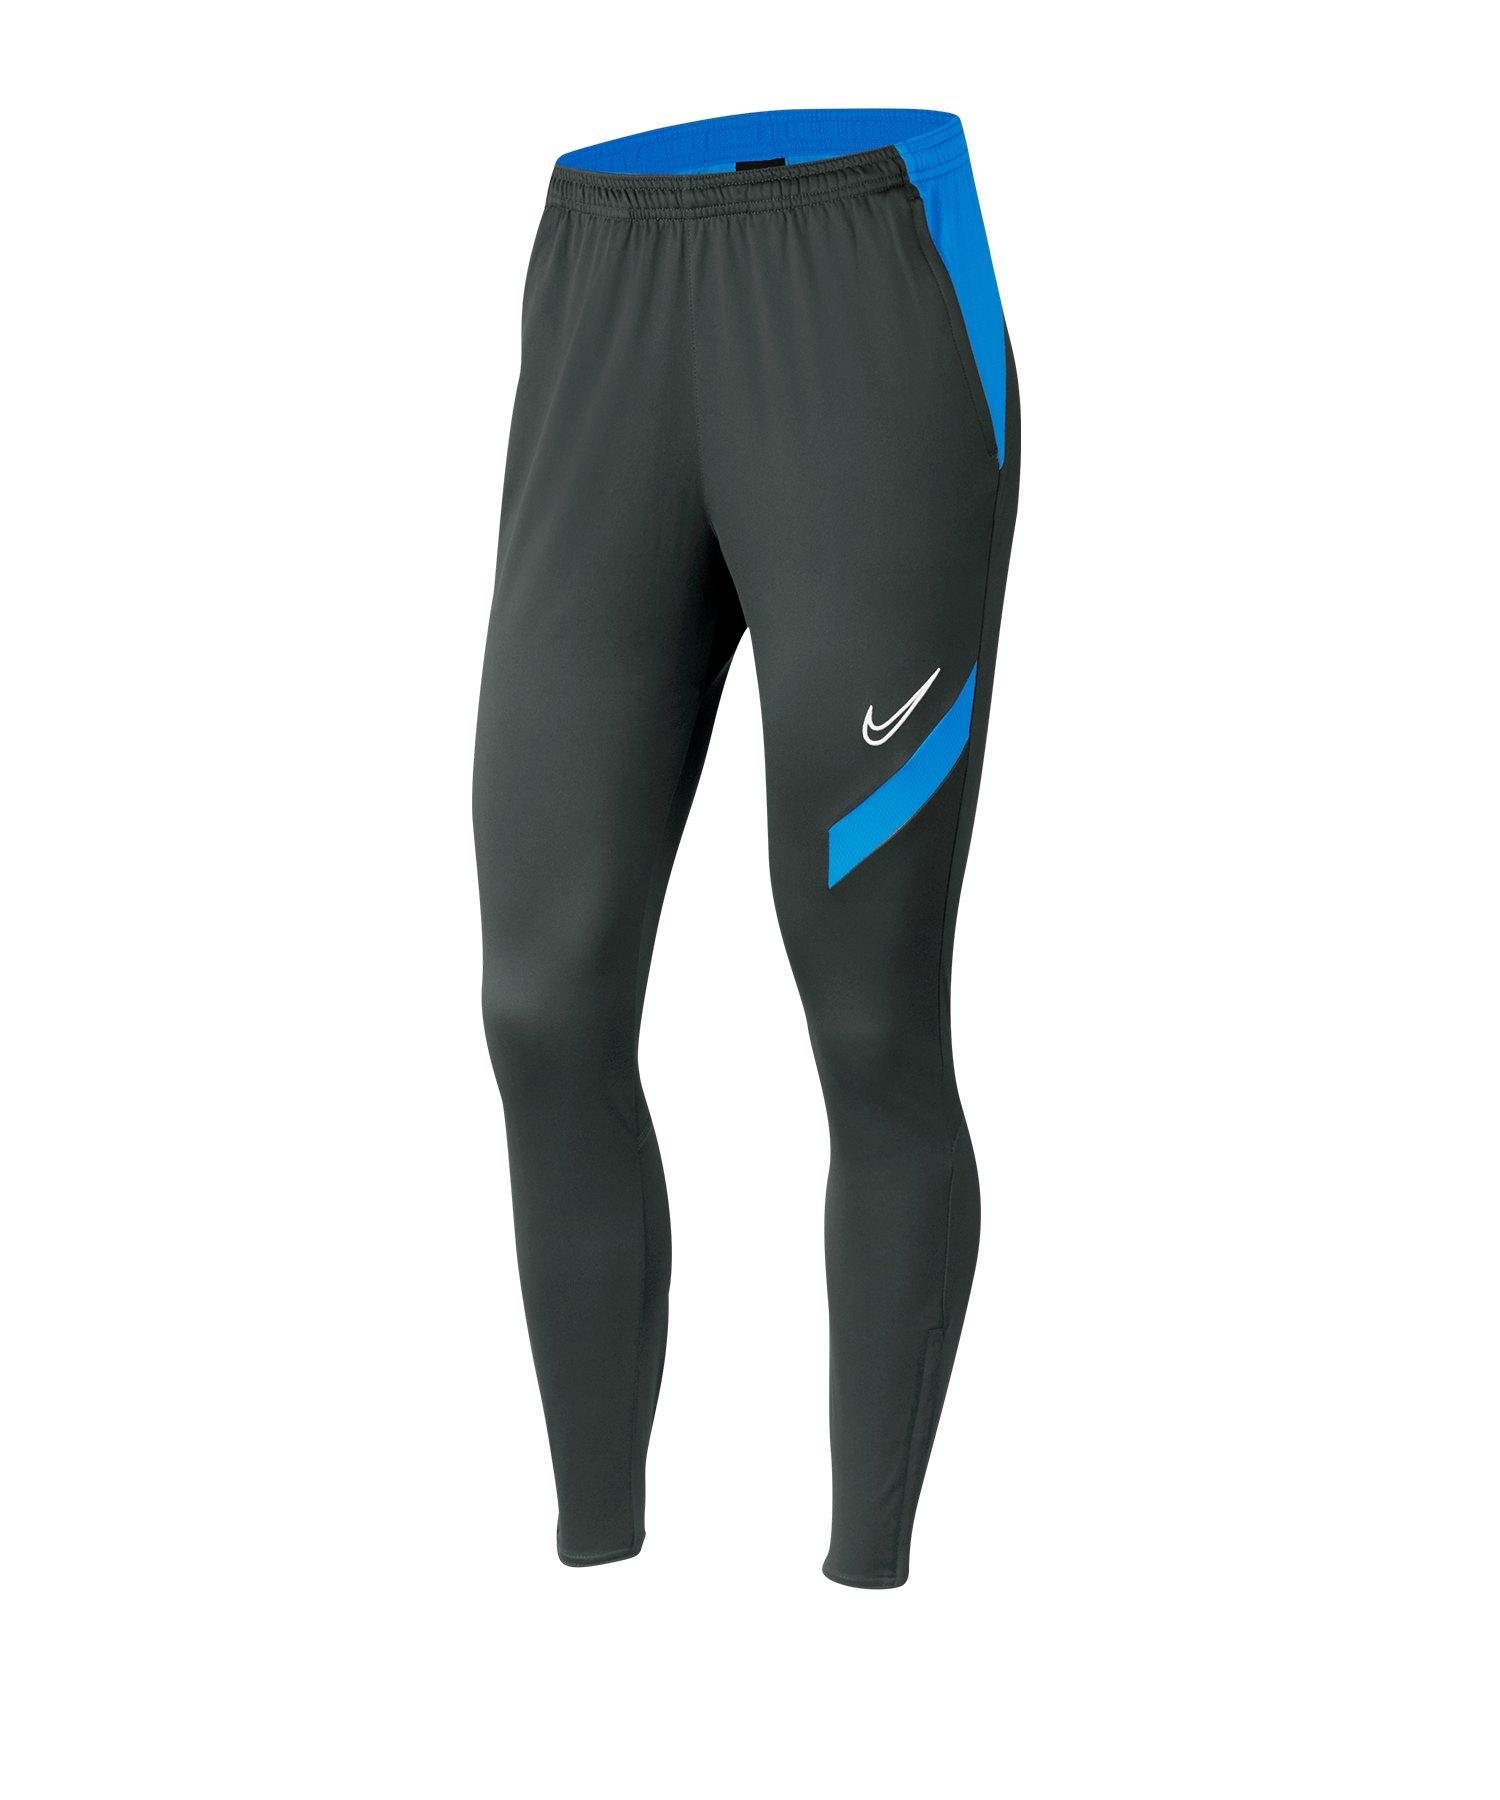 Nike Academy Pro Pants Damen Grau Blau F060 - grau